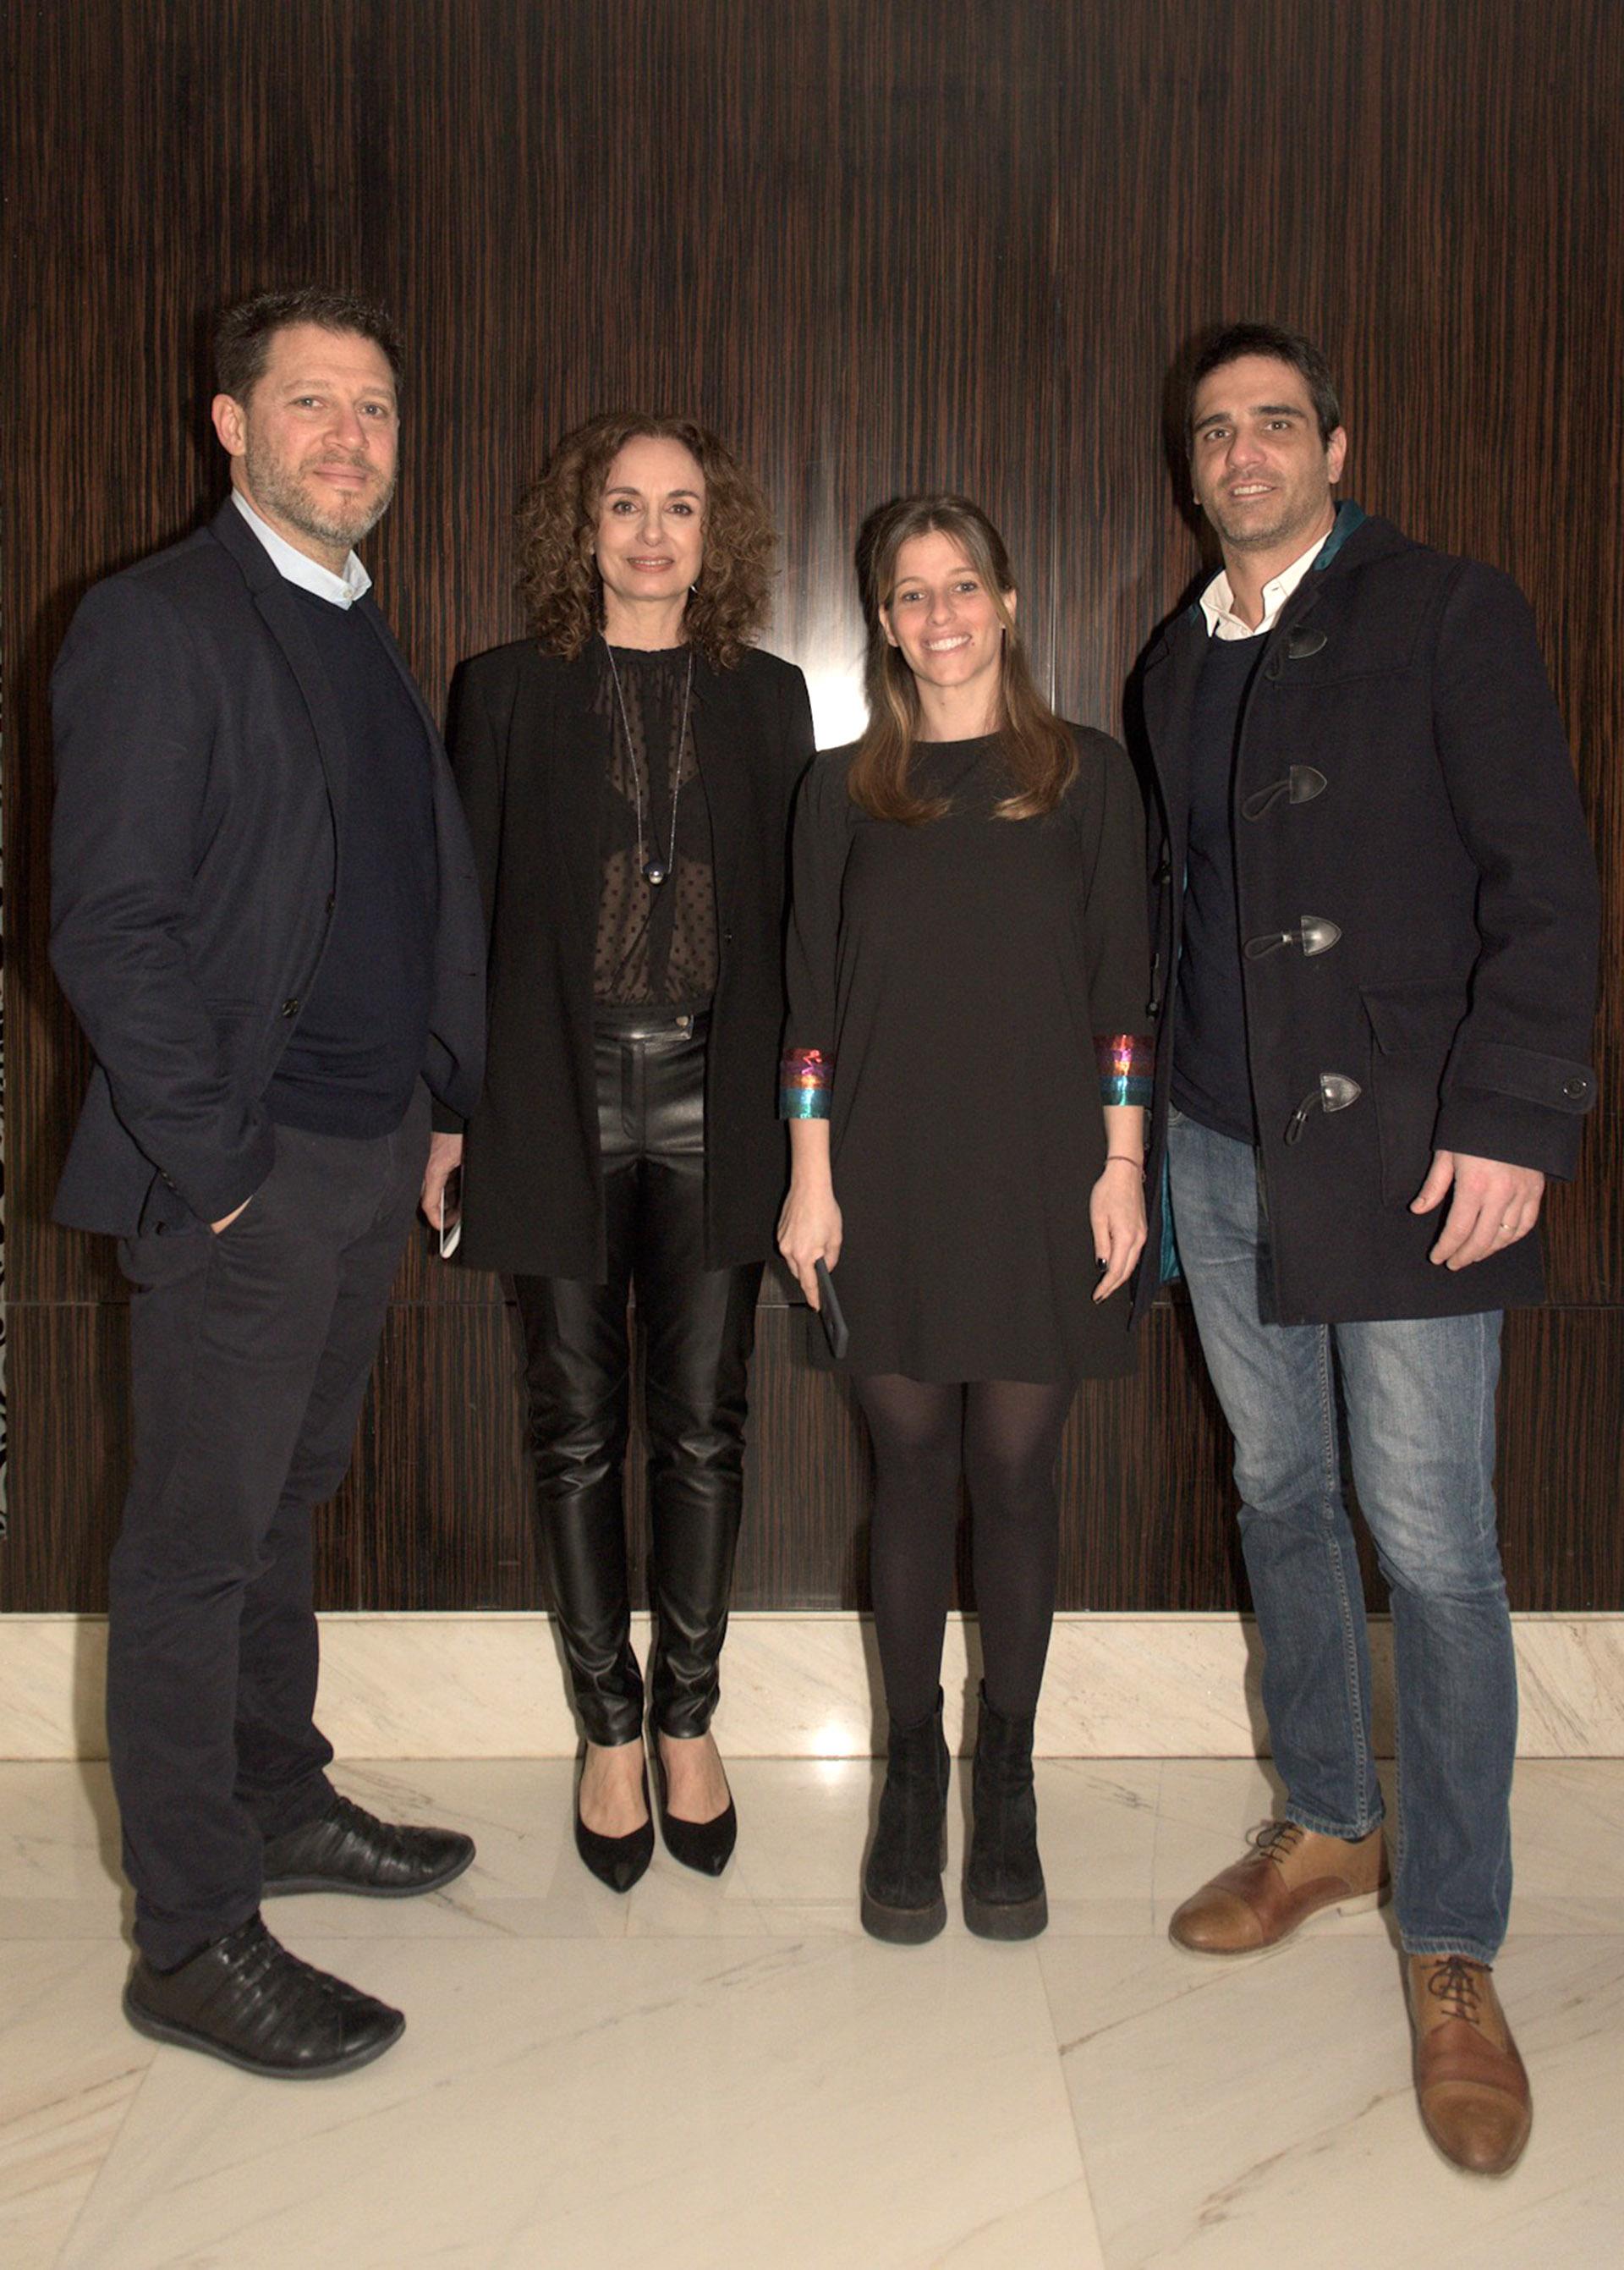 Damián Kirzner, Gabi López junto a Priscila Pipman y Silvio Tourón, gerentes comerciales de Infobae.